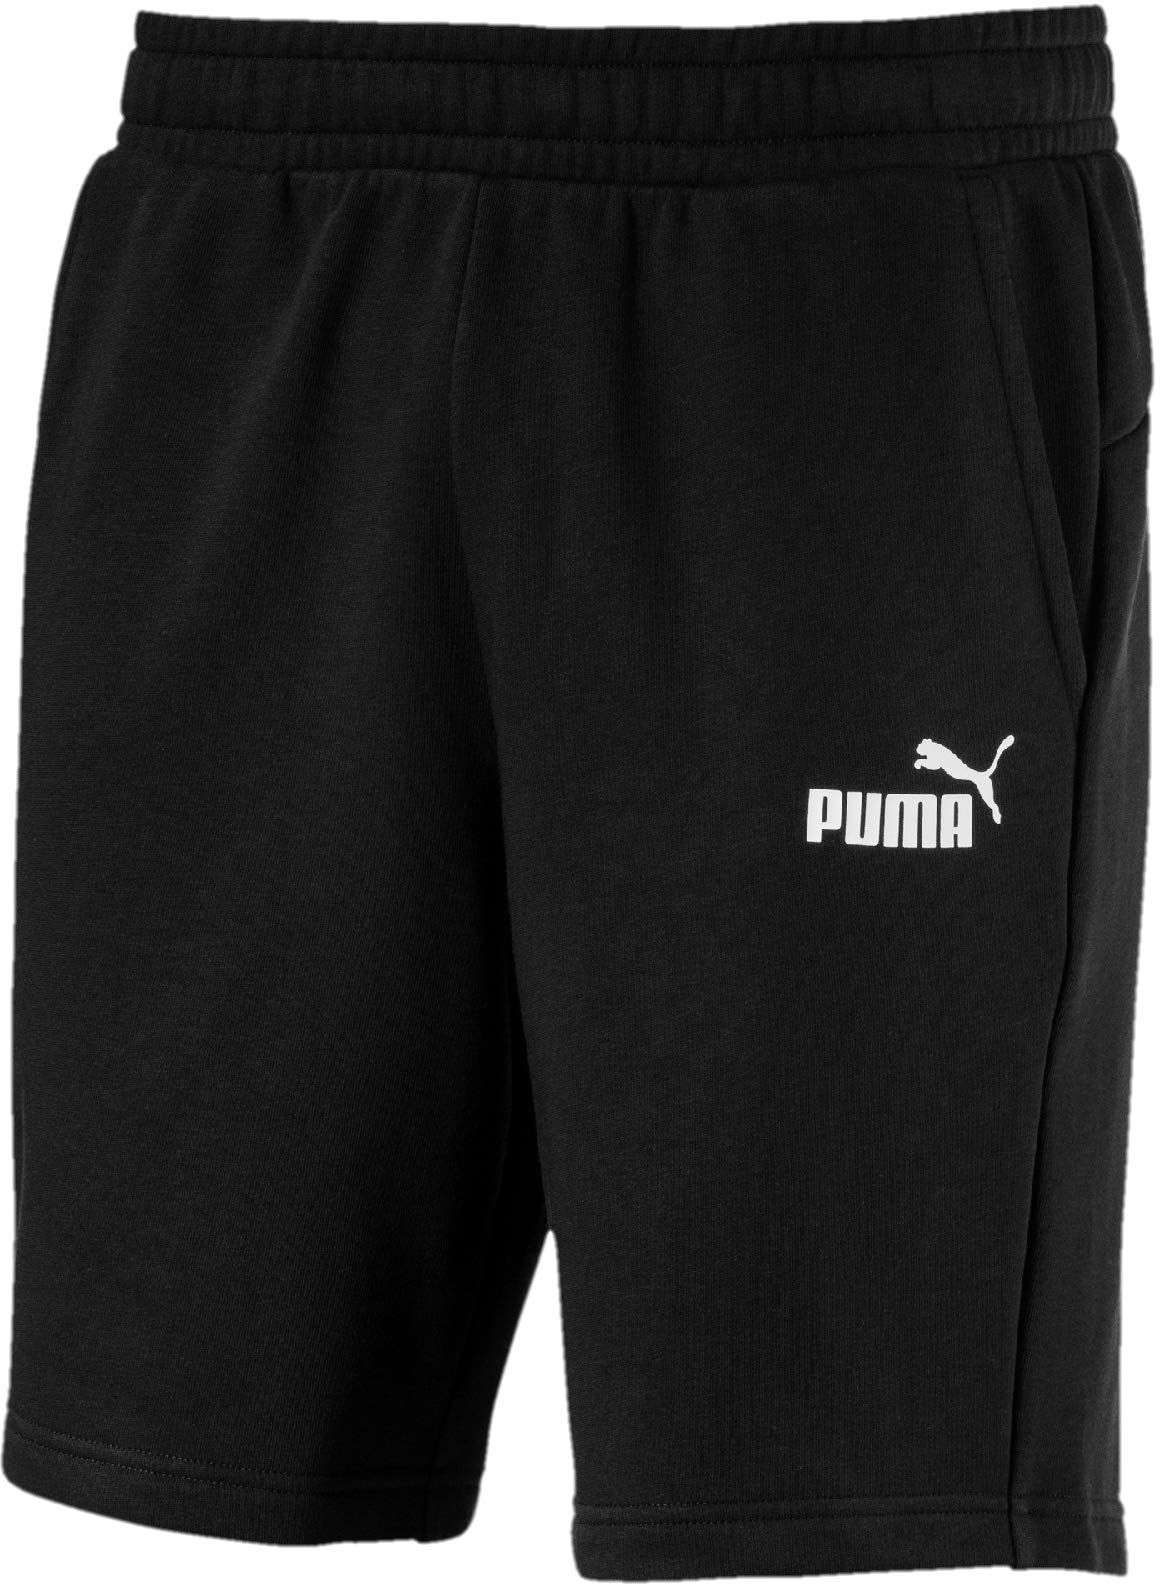 PUMA spodnie męskie Ess Sweat Bermudas 10 Tr czarny Puma Black S